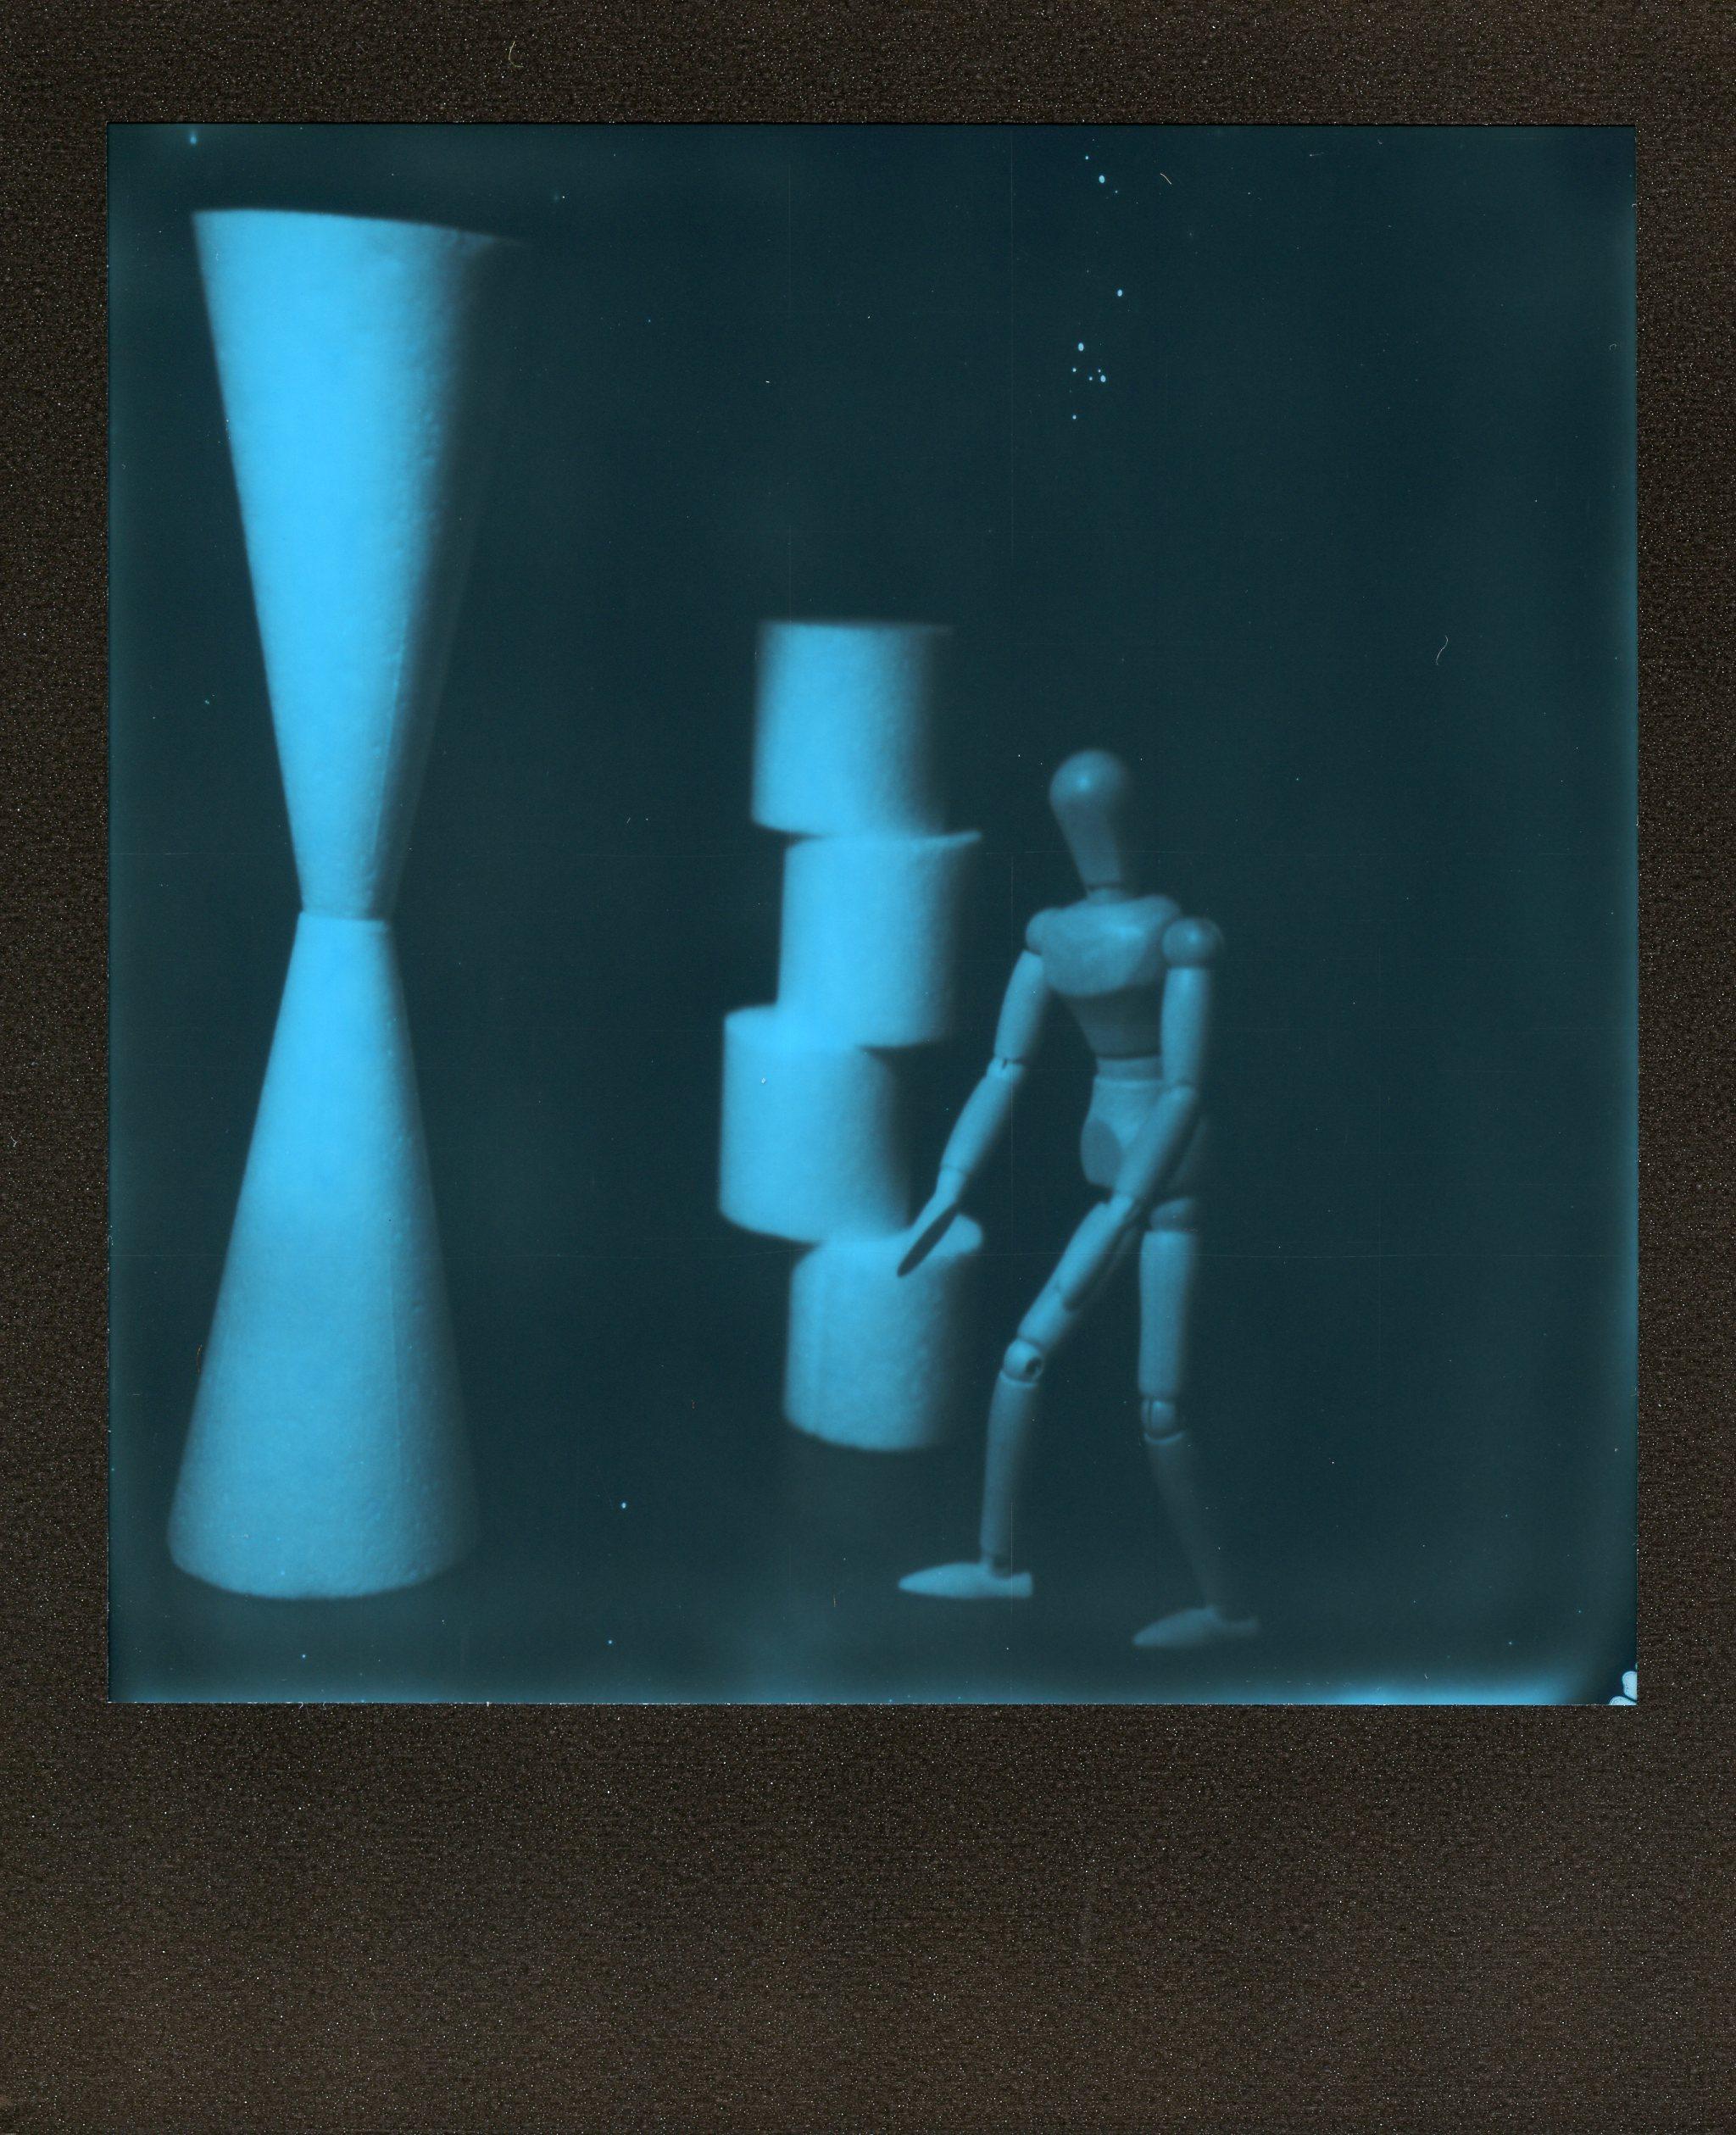 ODM [One dimensional man]